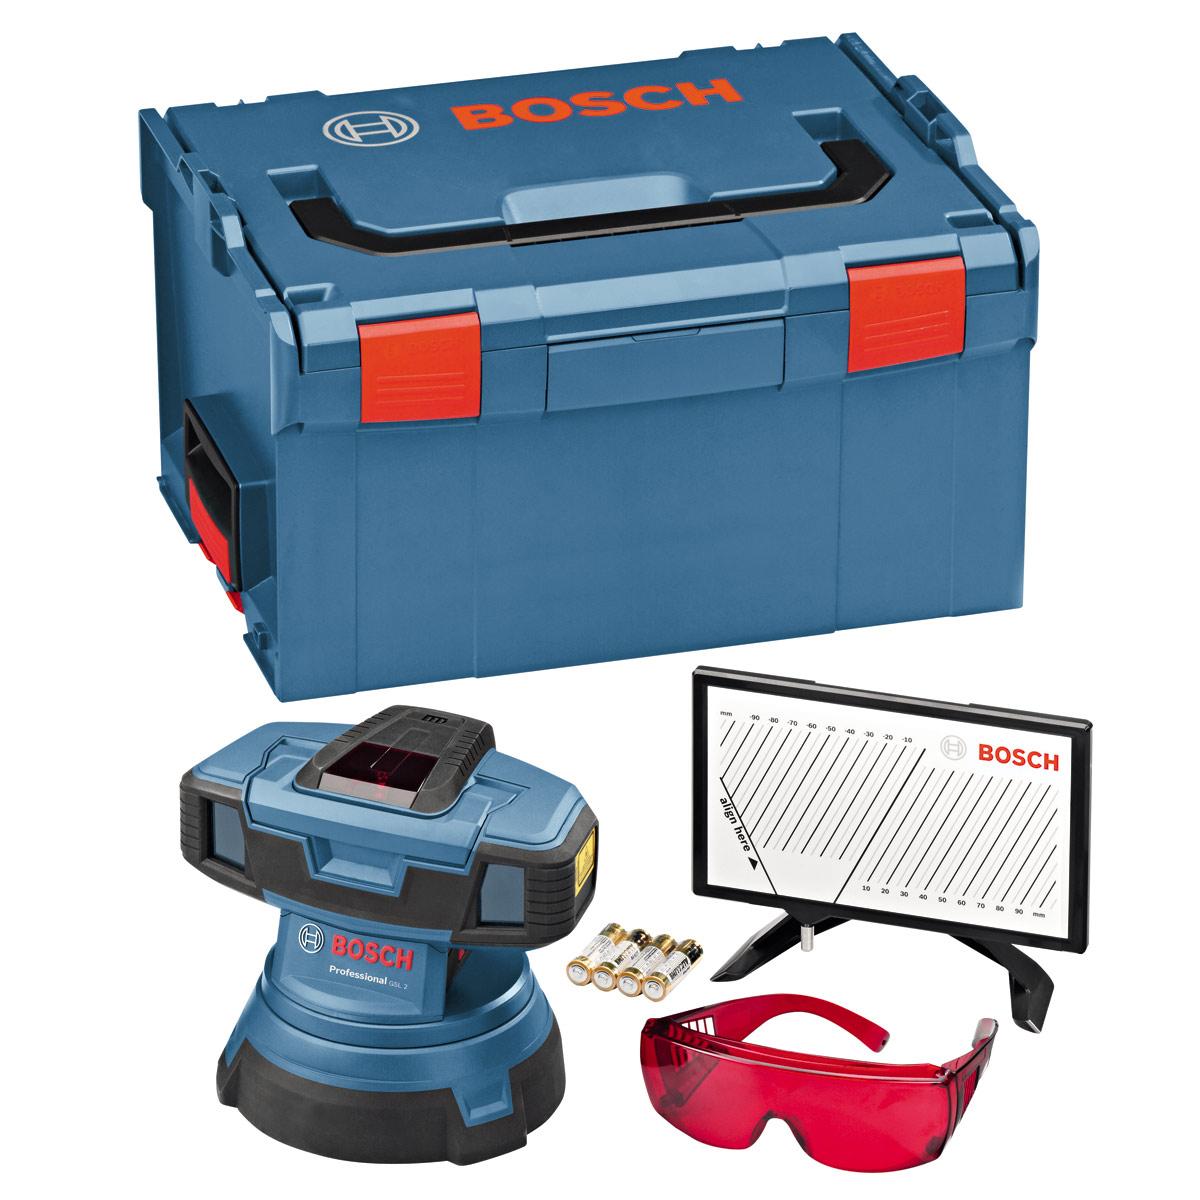 bosch gsl 2 professional manual surface laser rh vpcivil co in bosch garden tools manuals bosch tools manuals download